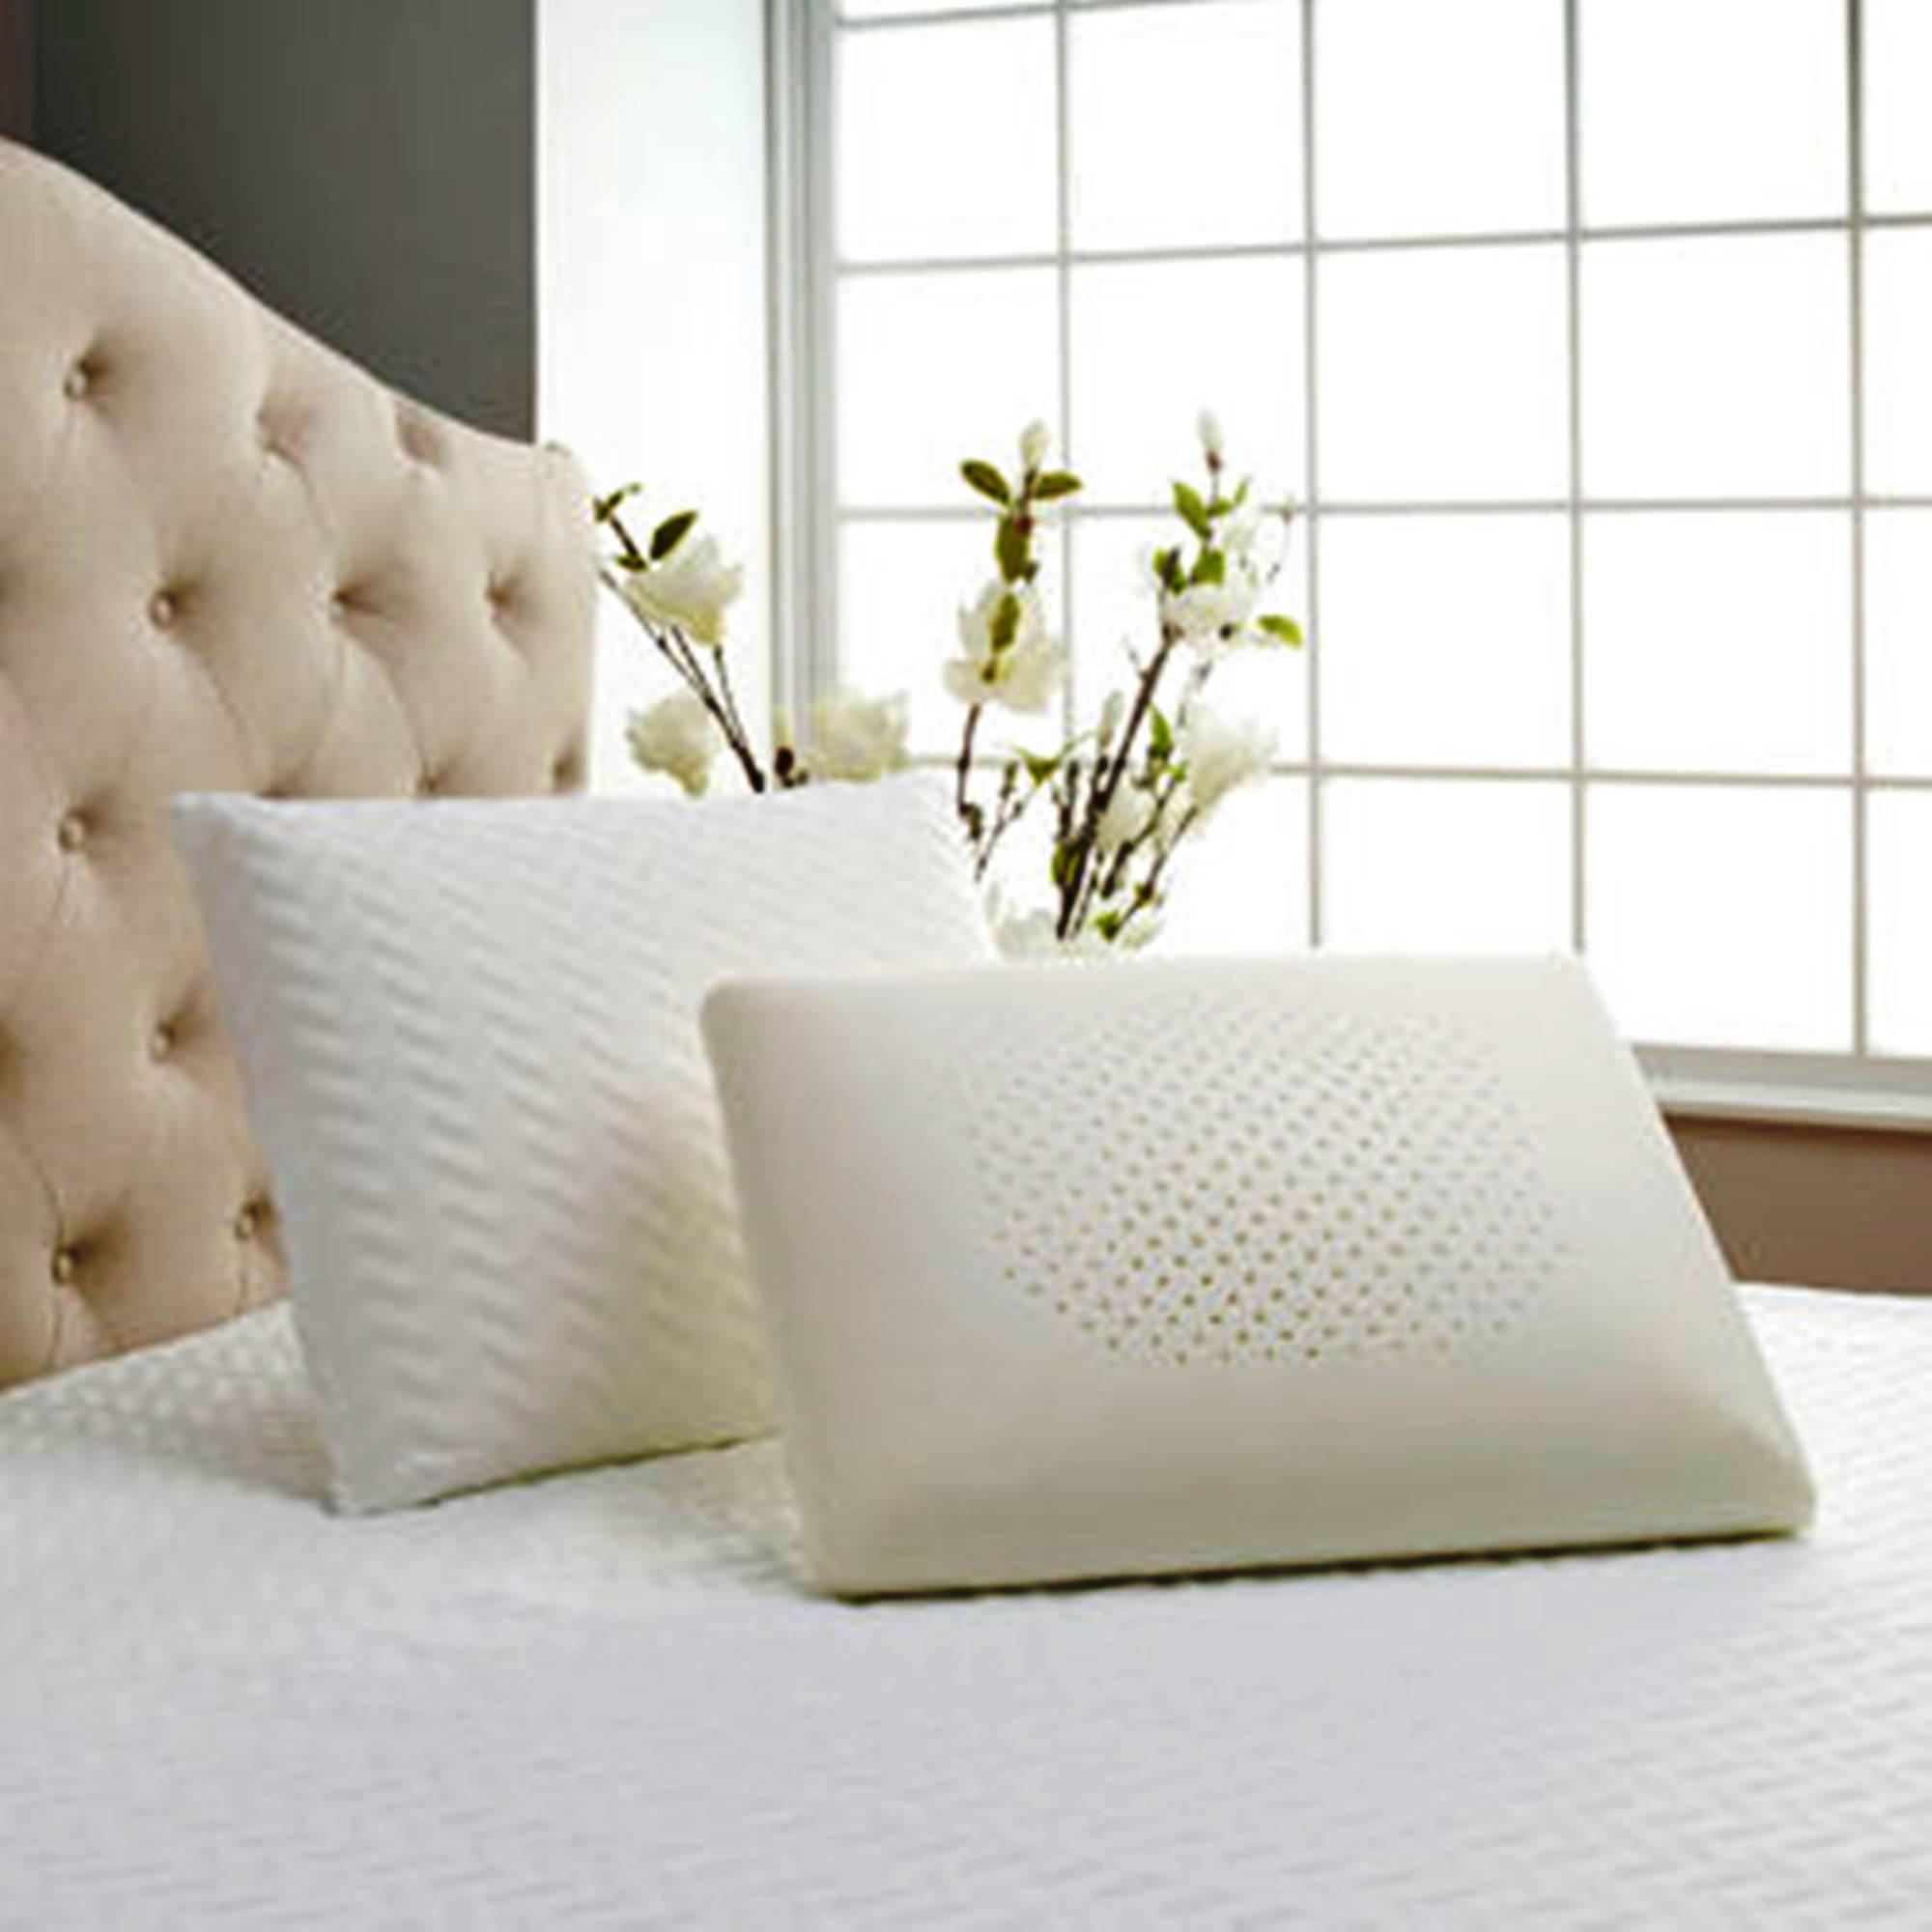 Isotonic Serene Comforttech Foam Pillow Traditional Side Sleeper